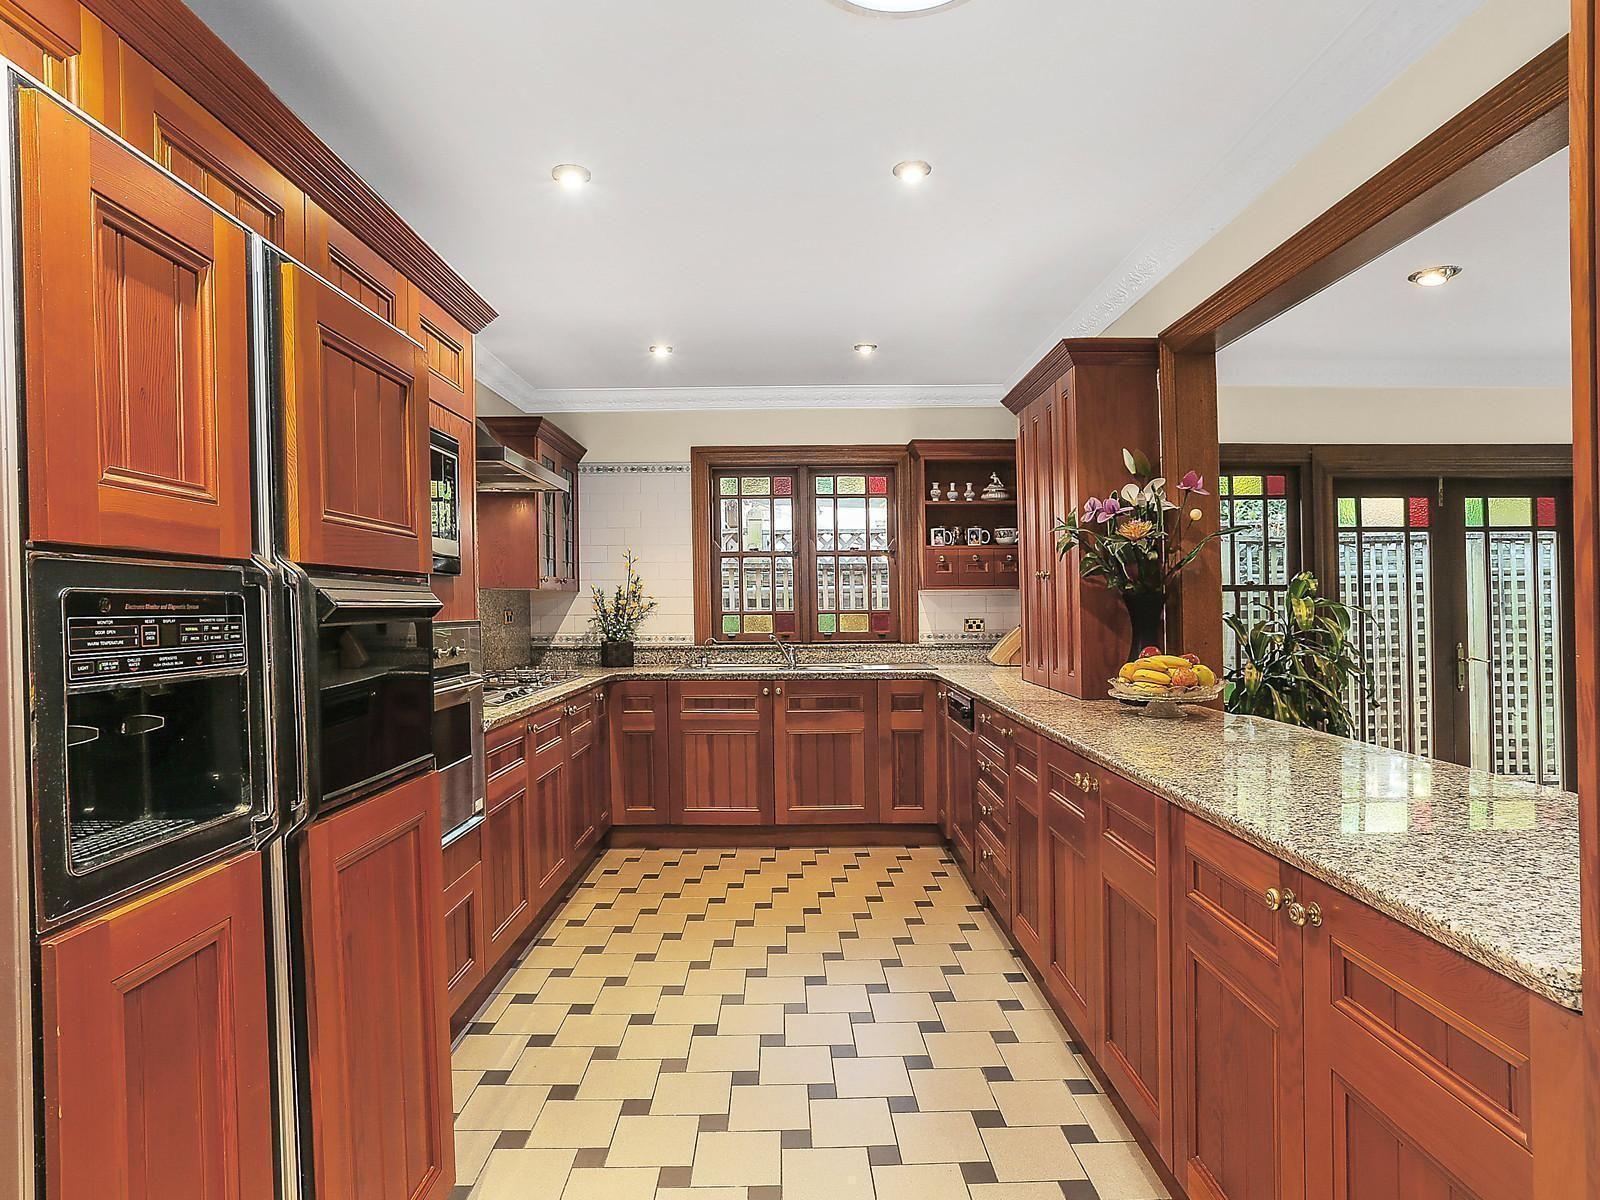 www.rebeccabeaumontinteriordesign.com   Kitchen design examples ...